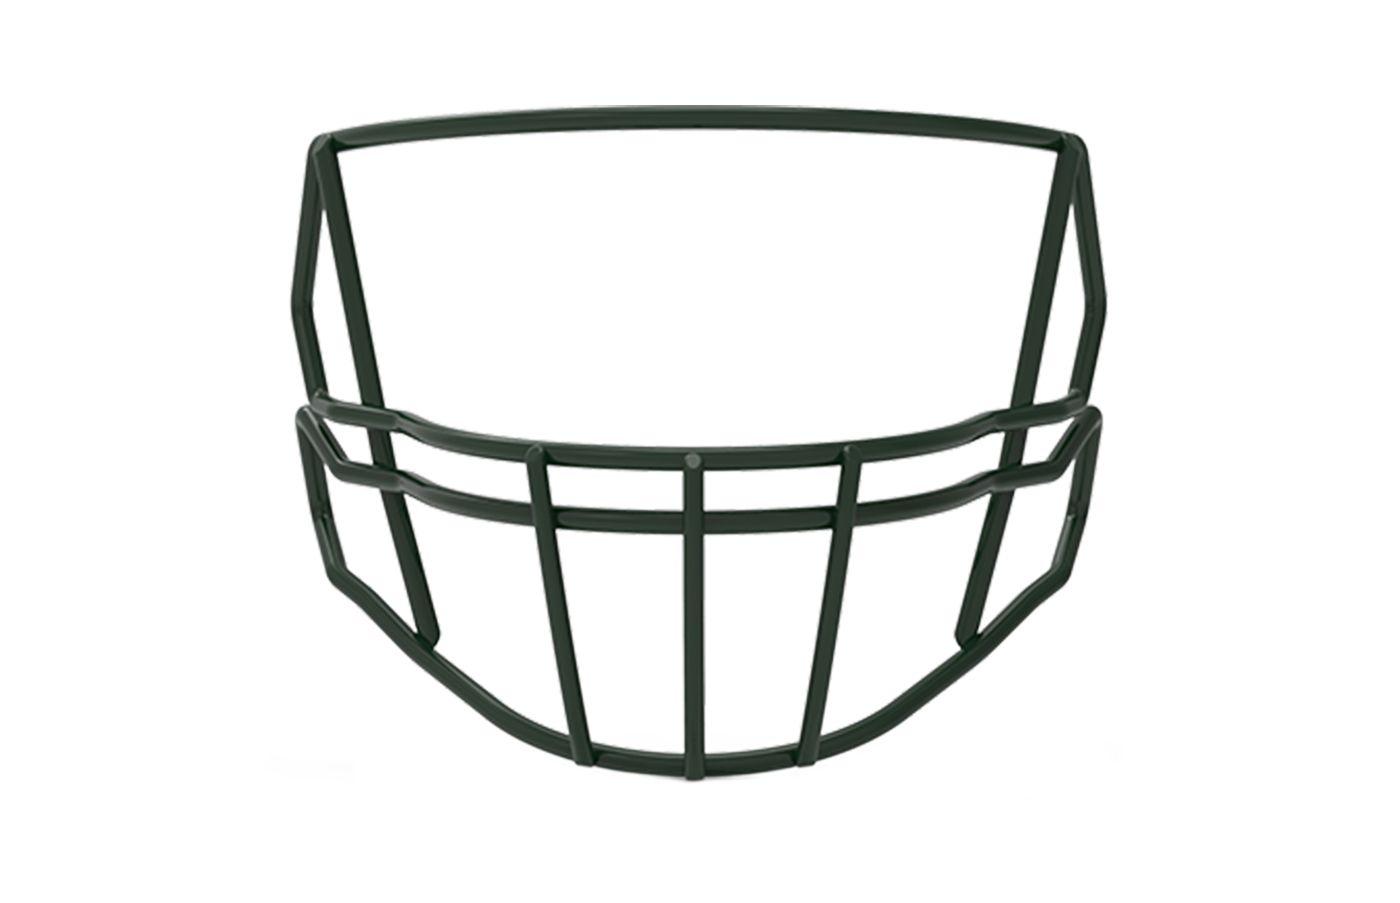 Riddell S2B-HS4 Football Facemask